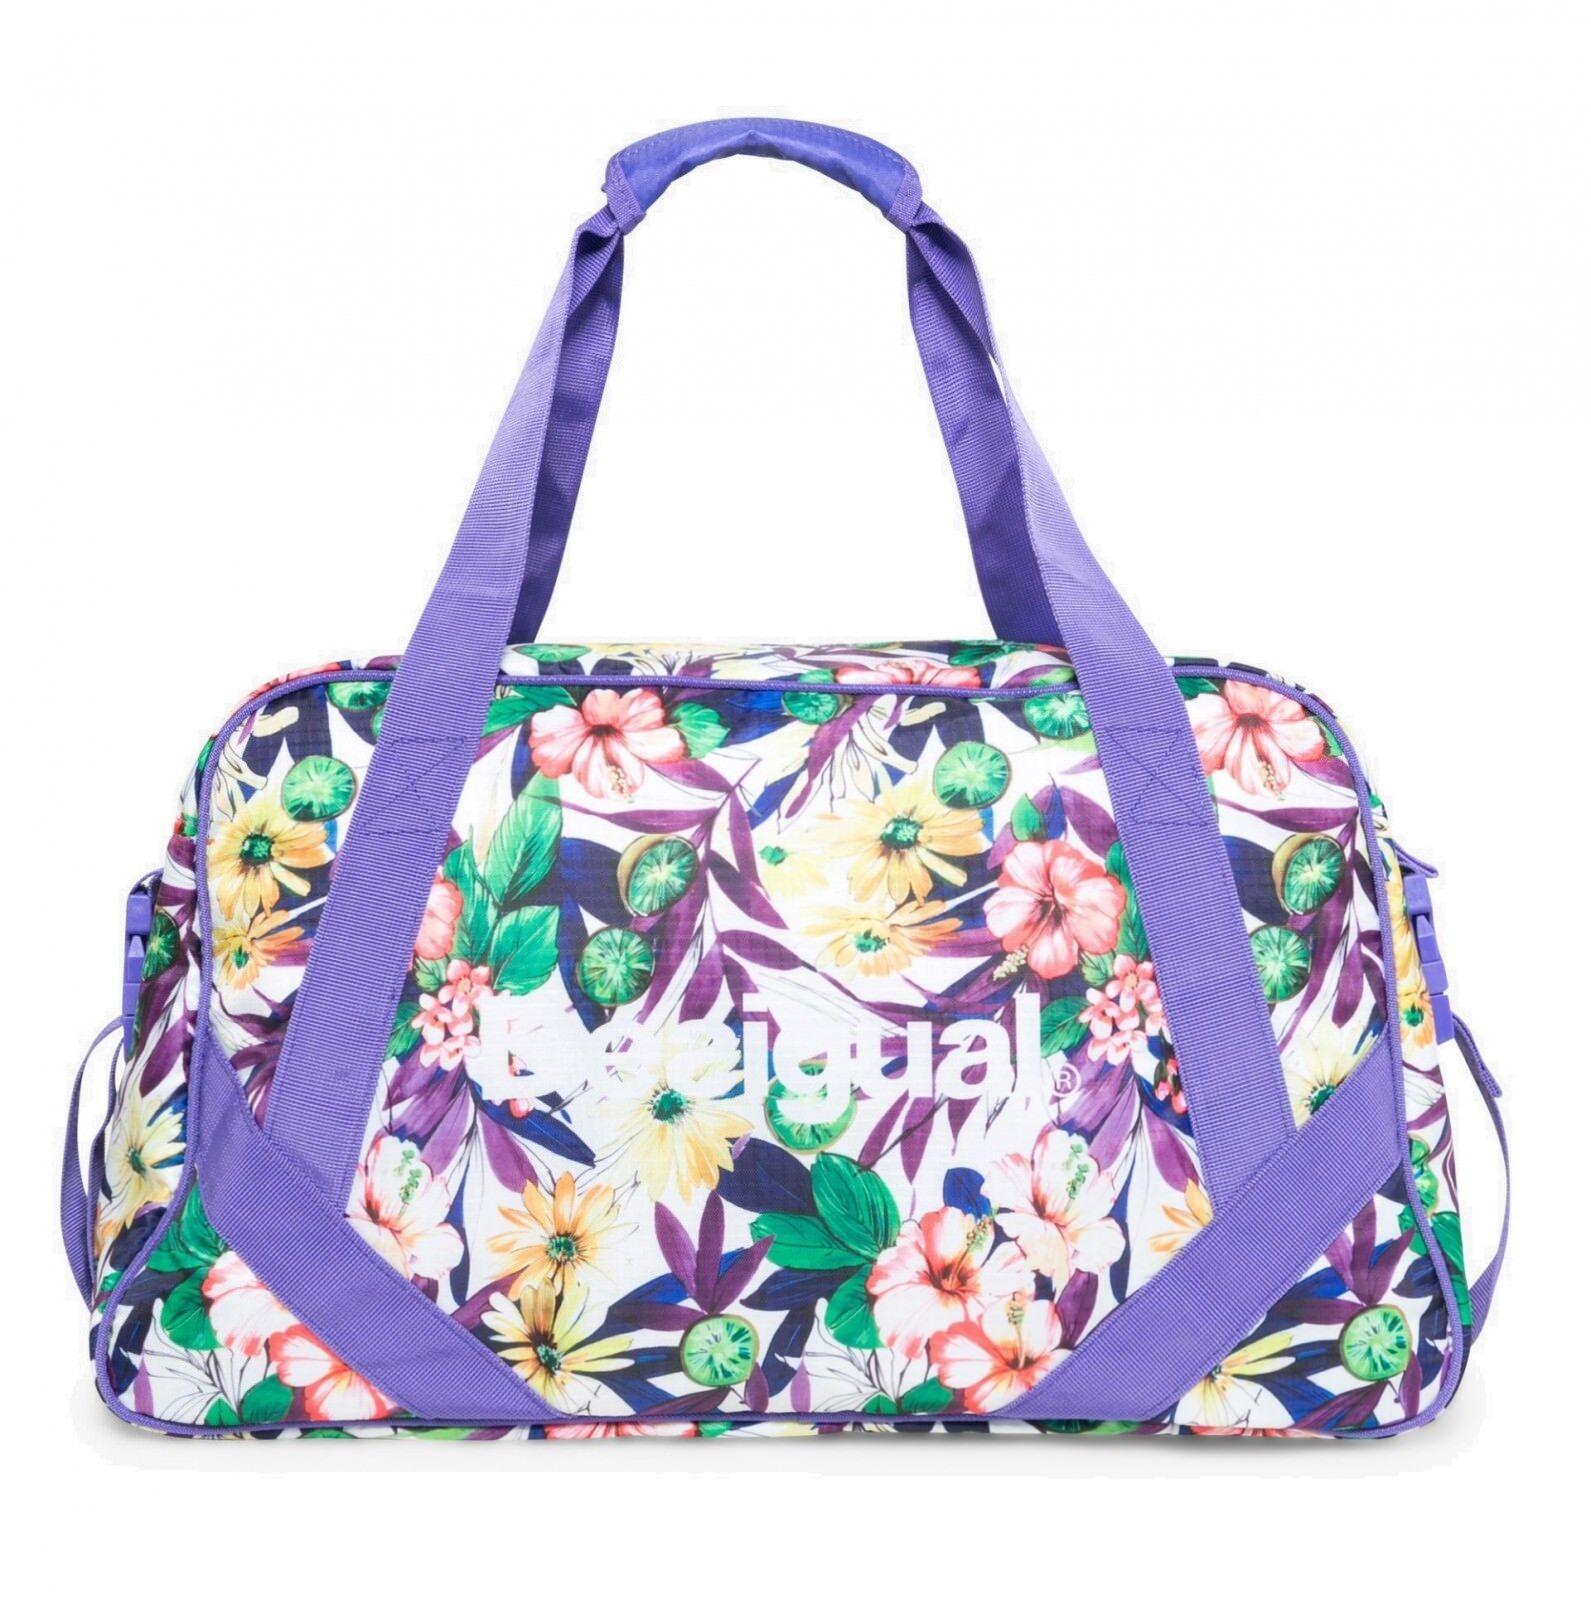 Desigual Bols L Bag G Reisetasche purplet green Mehrfarbig